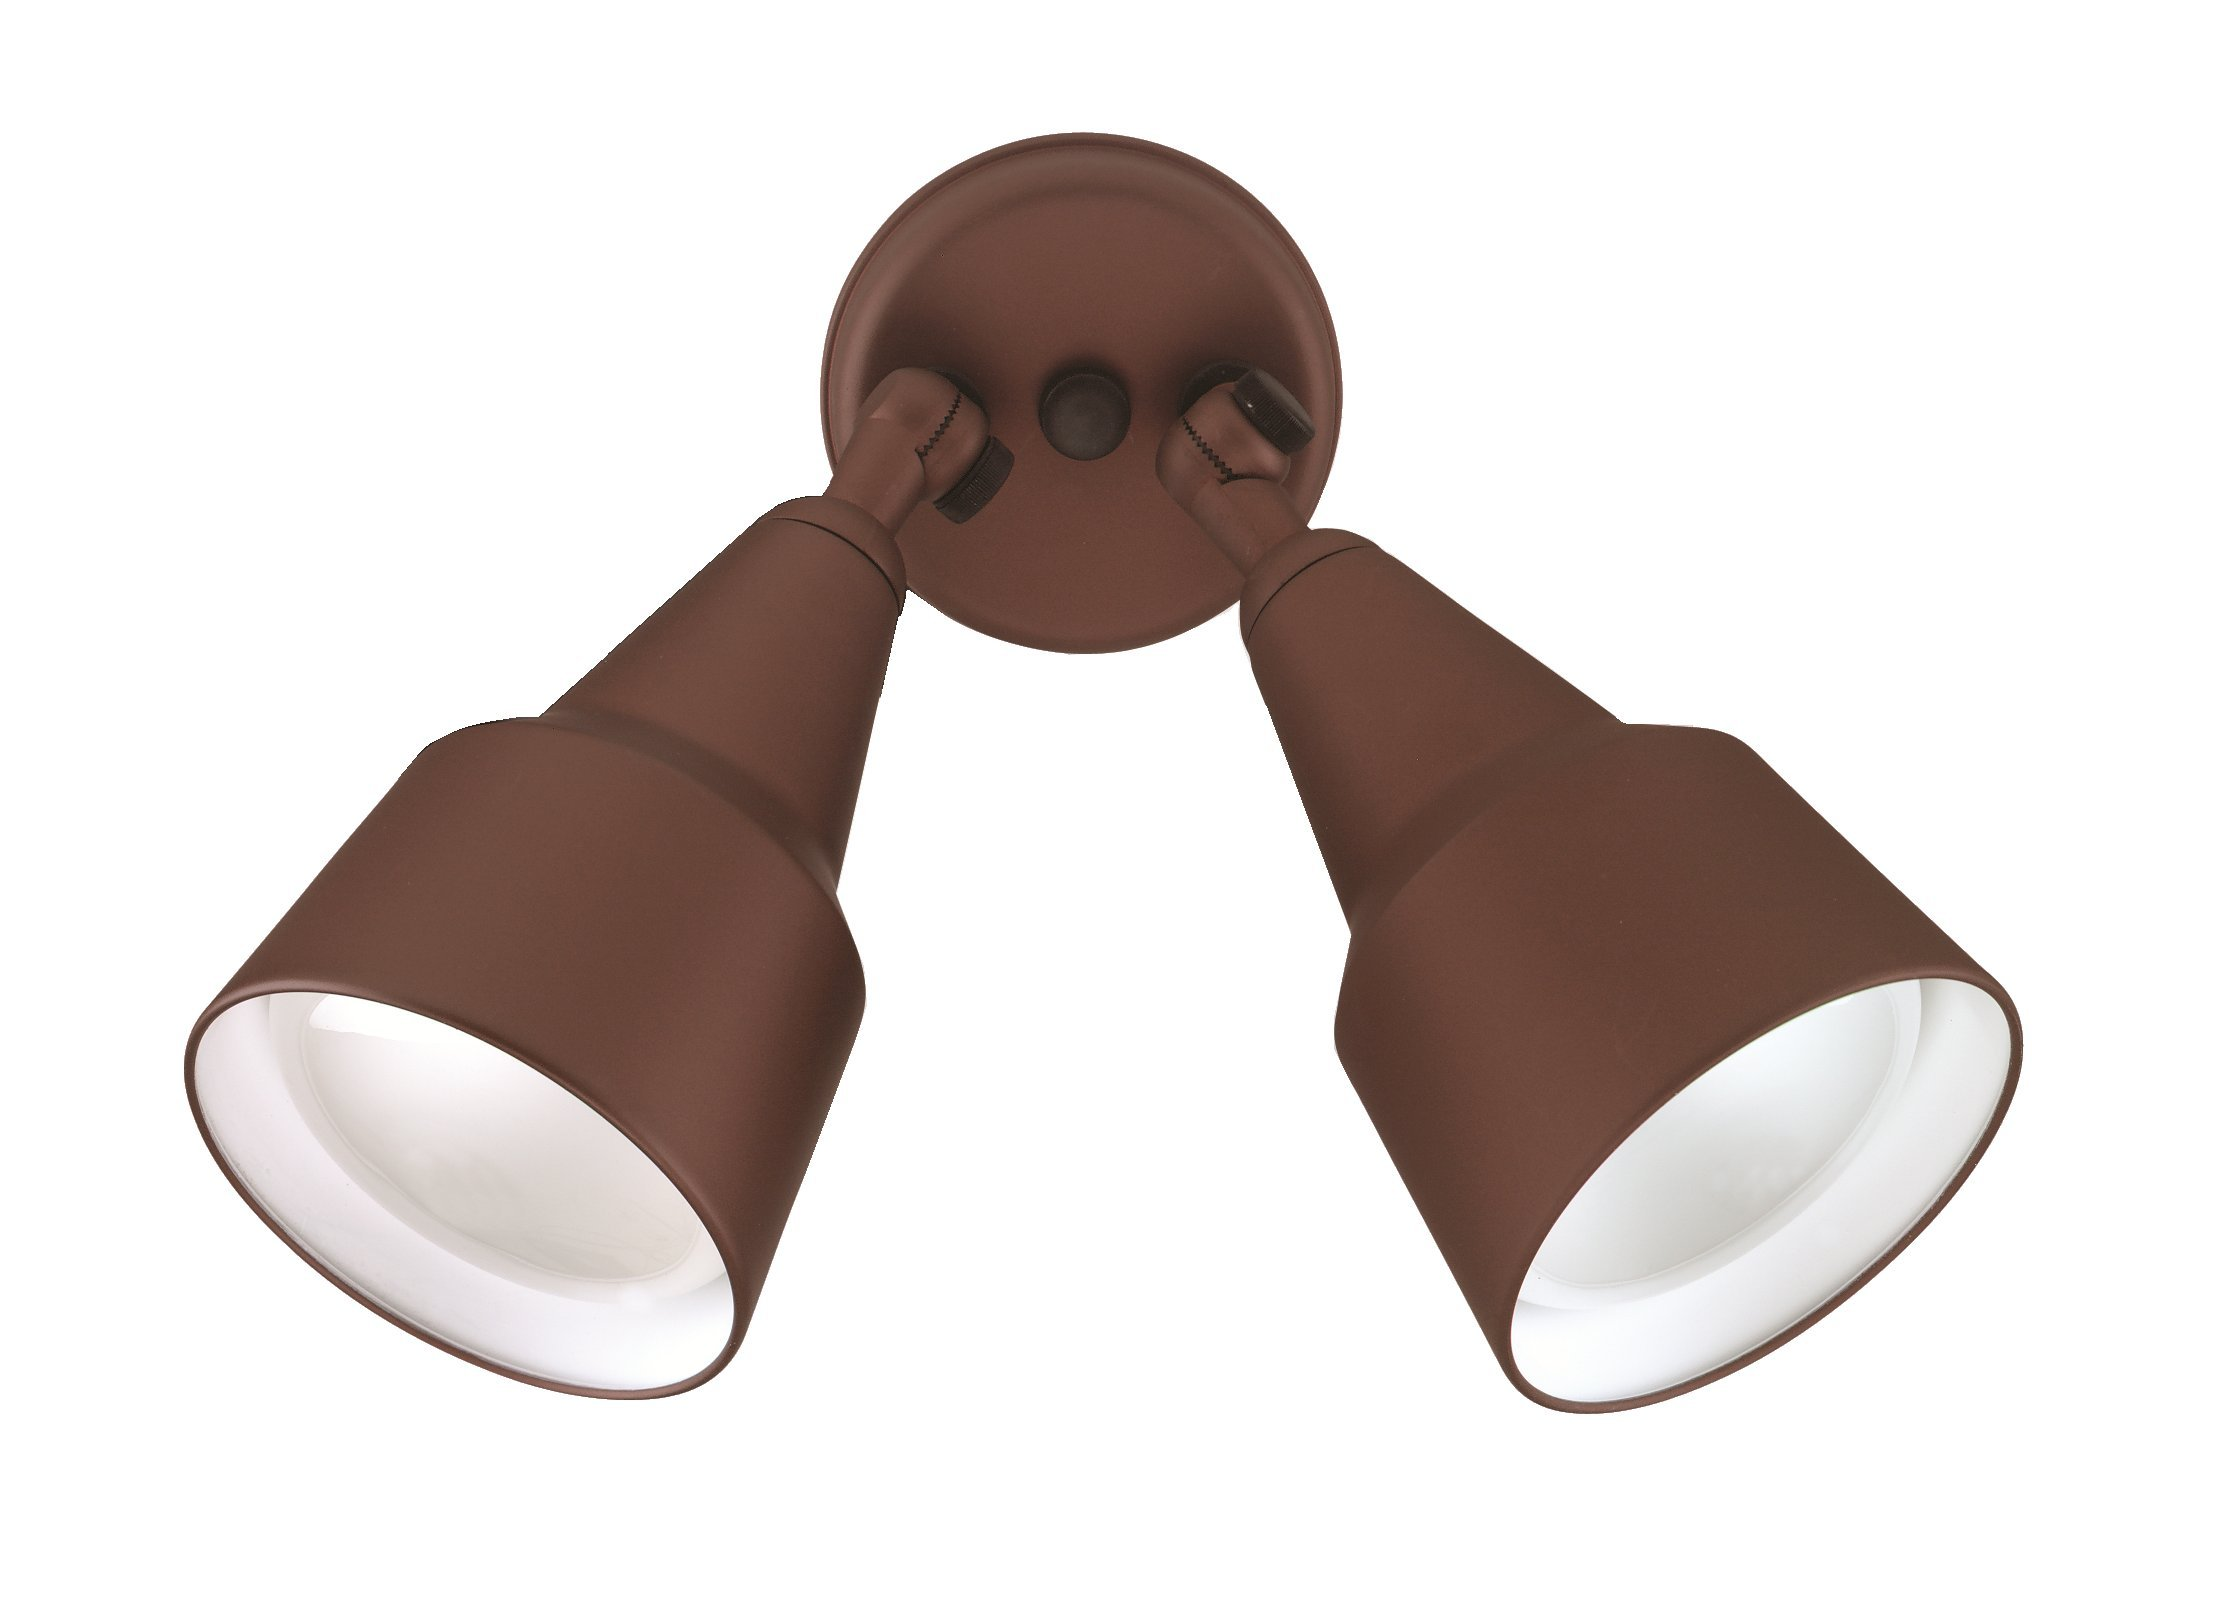 NICOR Lighting 150-Watt Double Cone Shaped Adjustable Outdoor Flood Light, Bronze (11128)